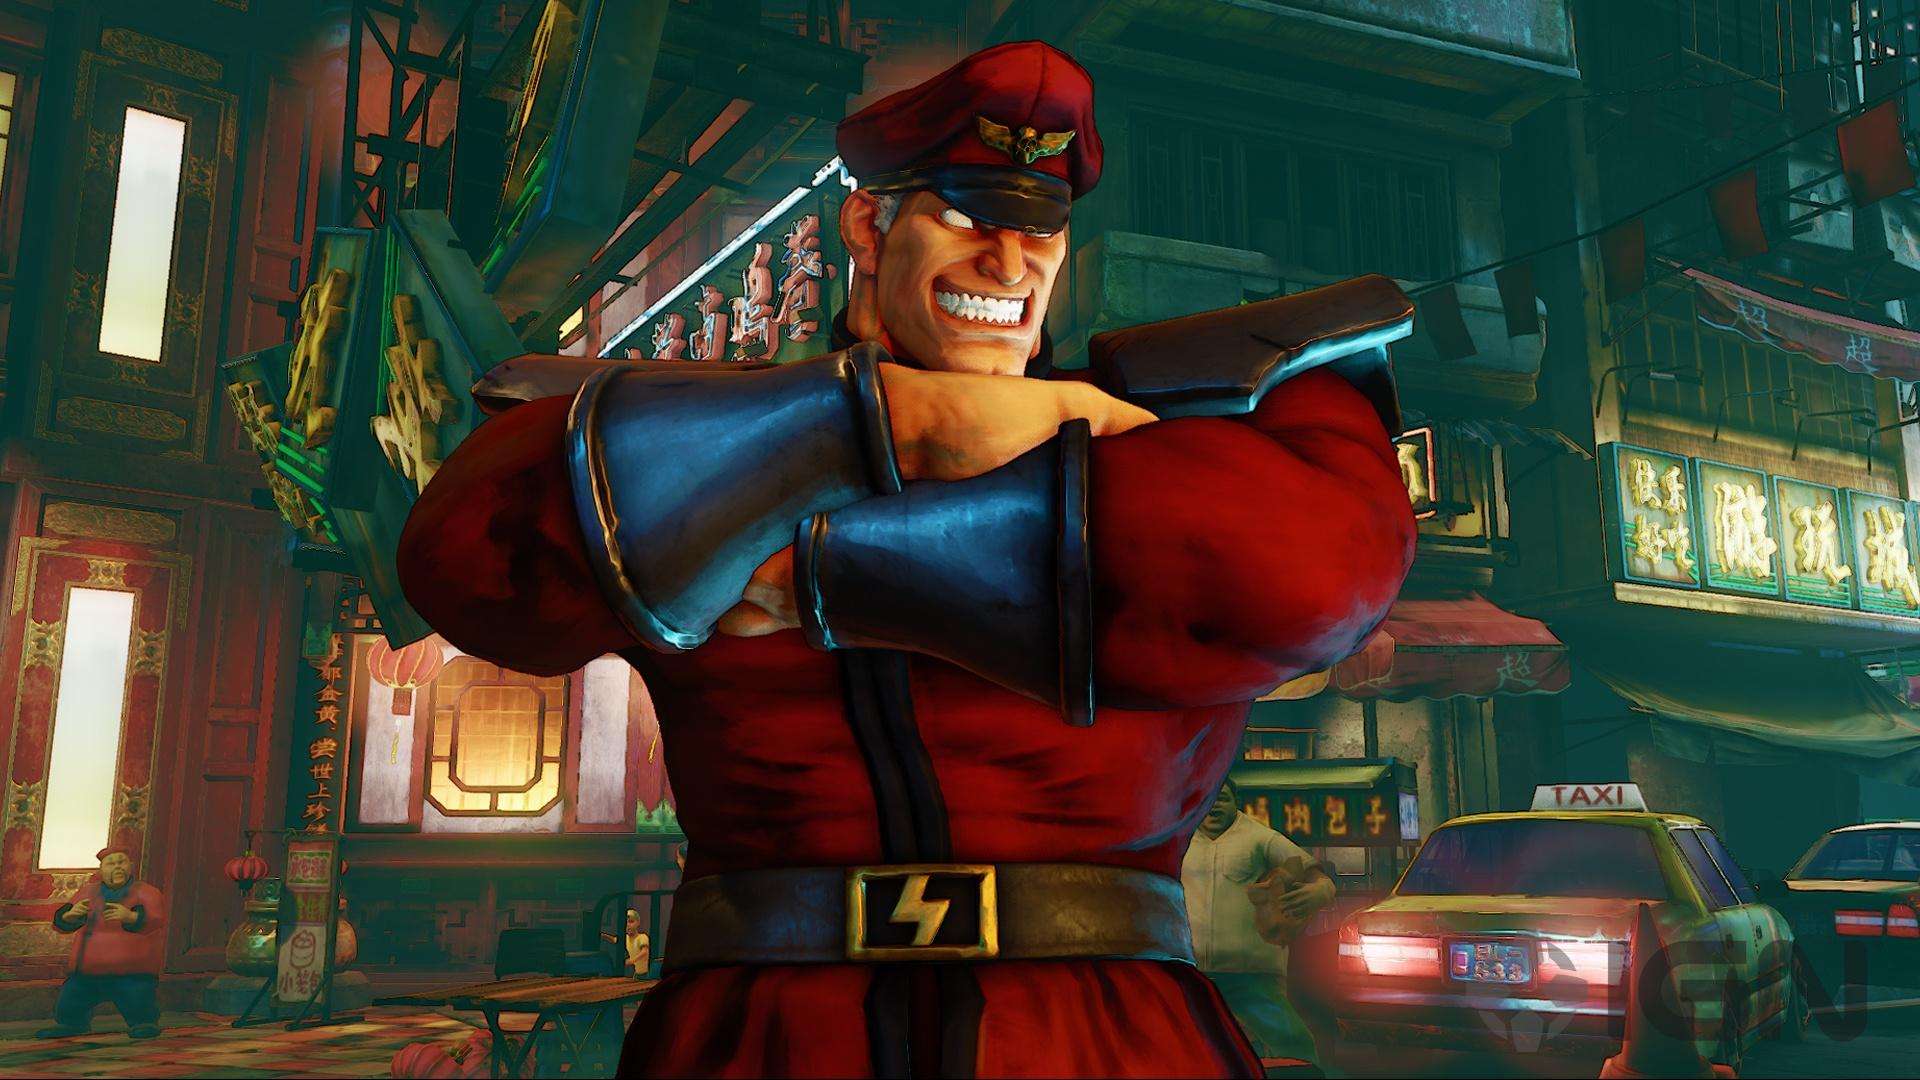 [GAMES] Street Fighter V - Personagem inédito! - Página 2 02-idle-pose-798r_dg1p.1920